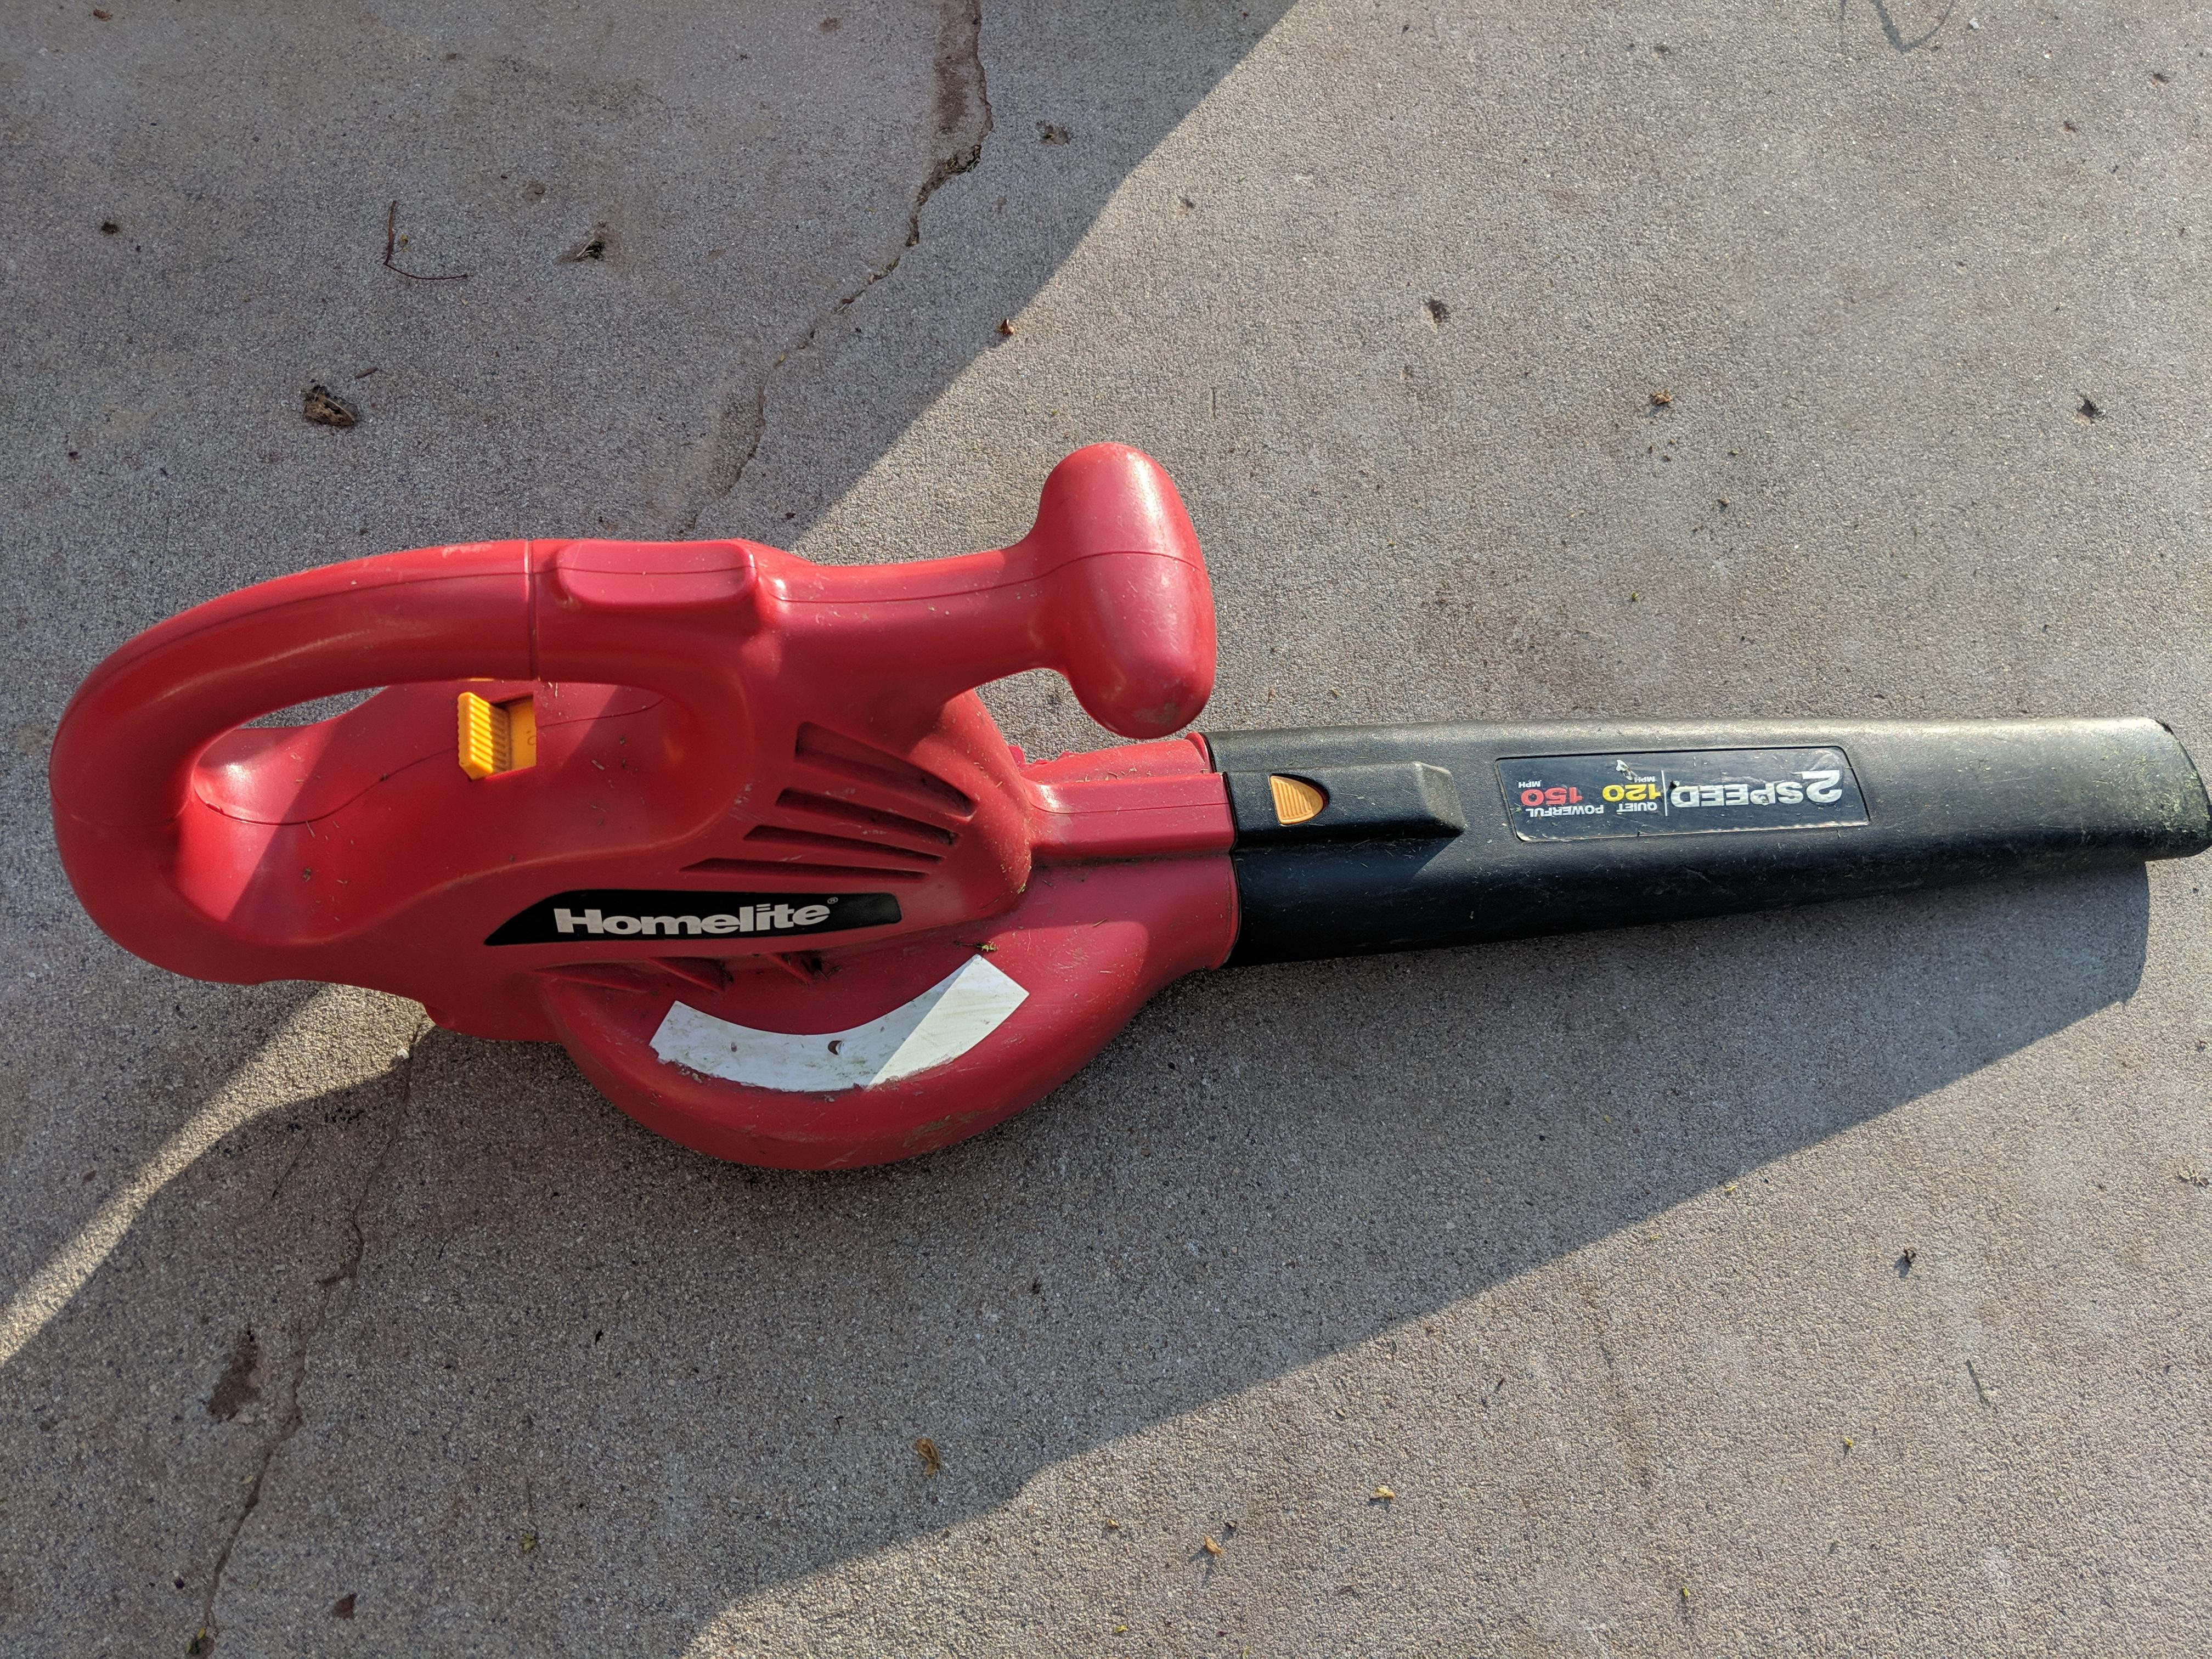 Homelite electric leaf blower